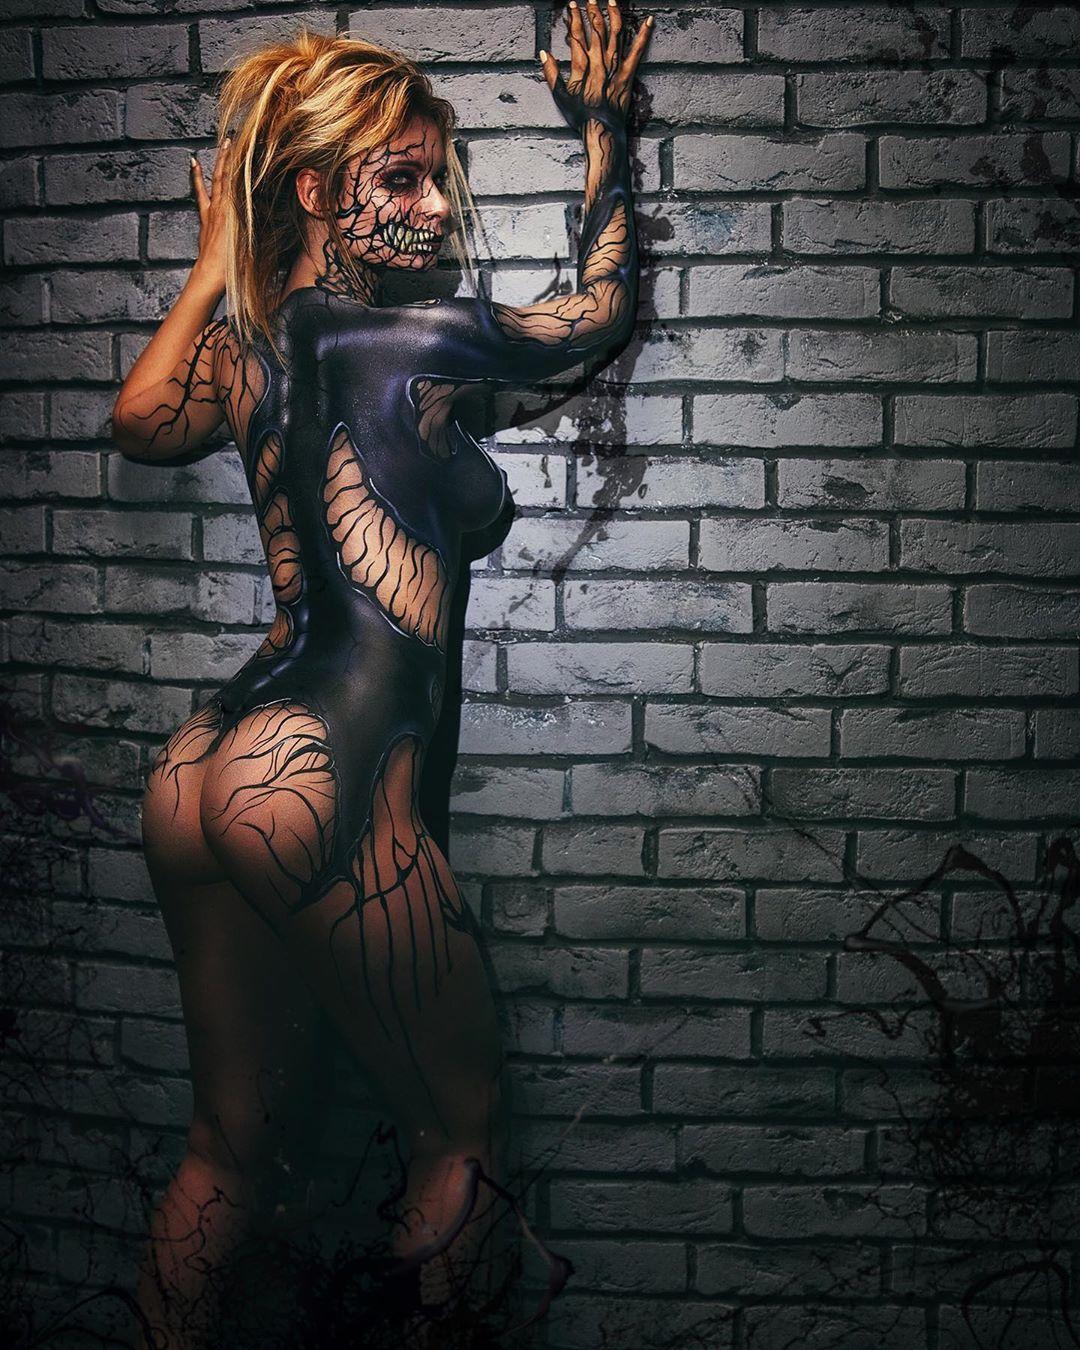 venom cosplay by Jannet